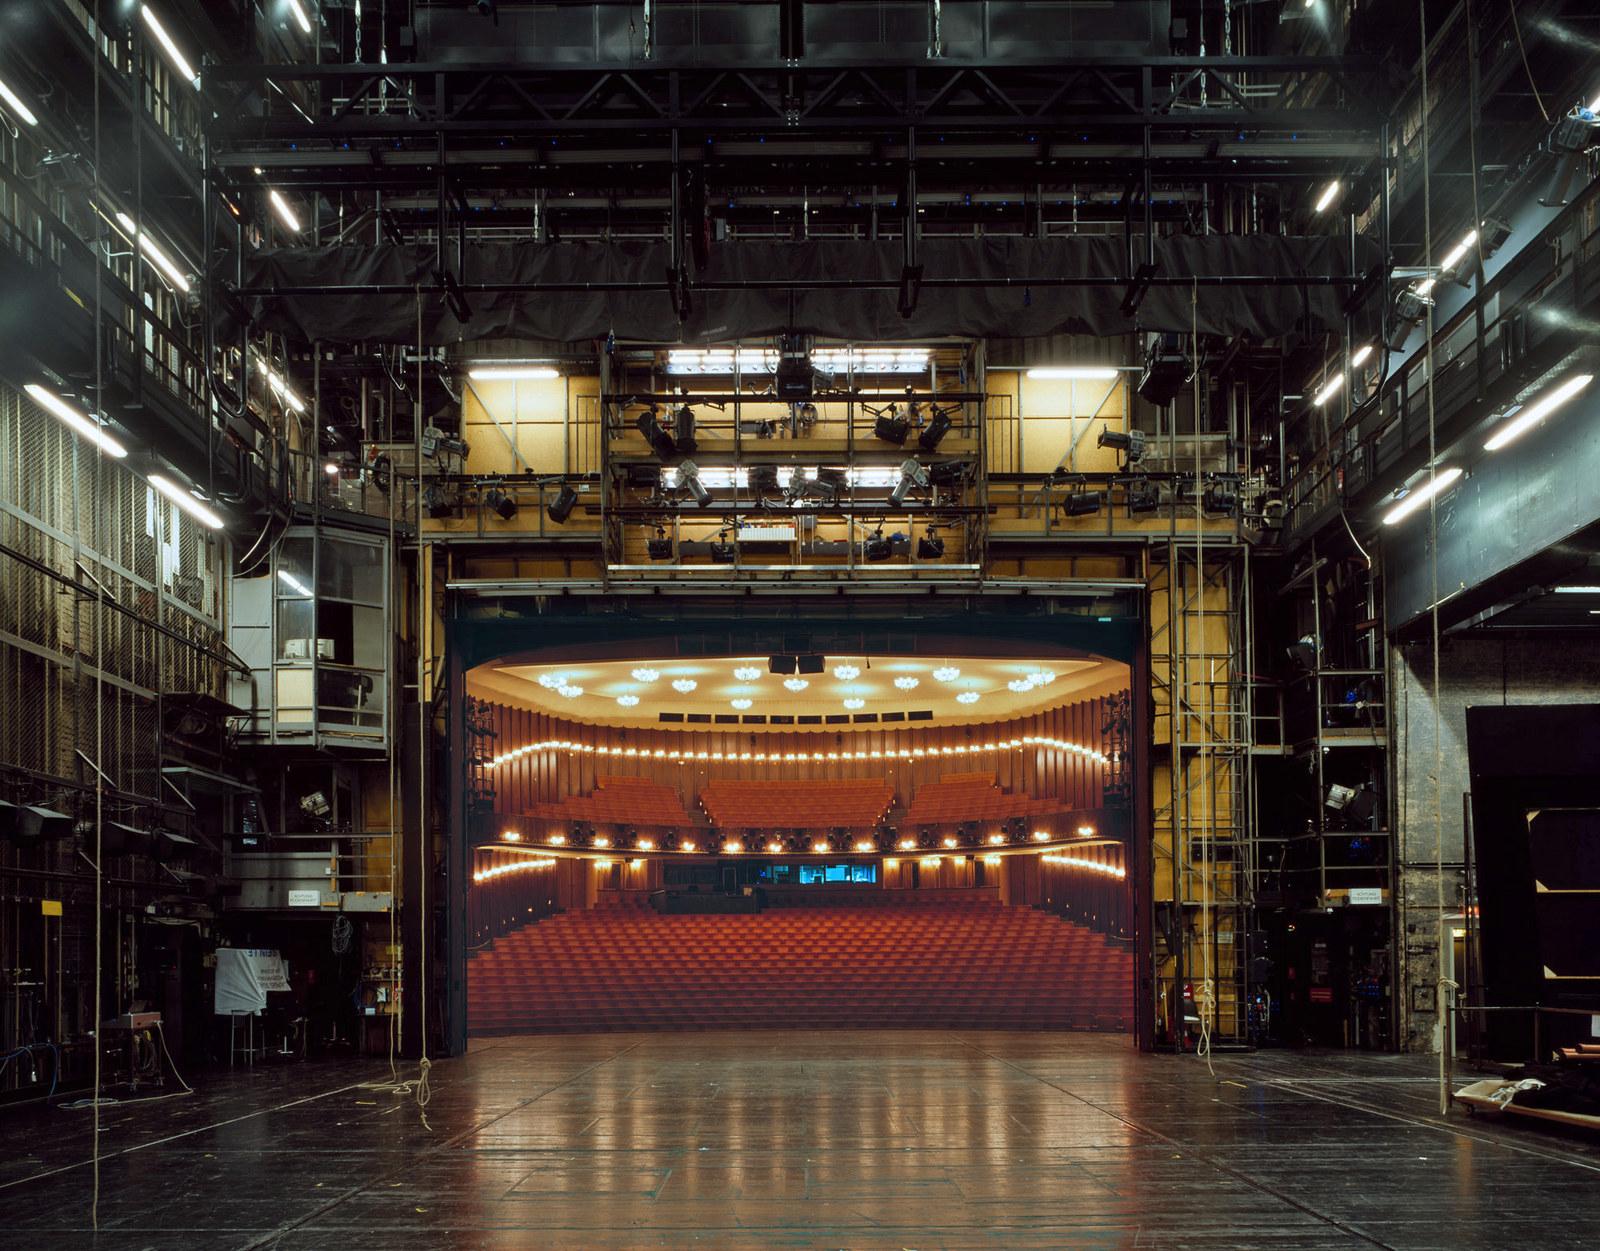 Schauspielhaus Bochum, Bochum